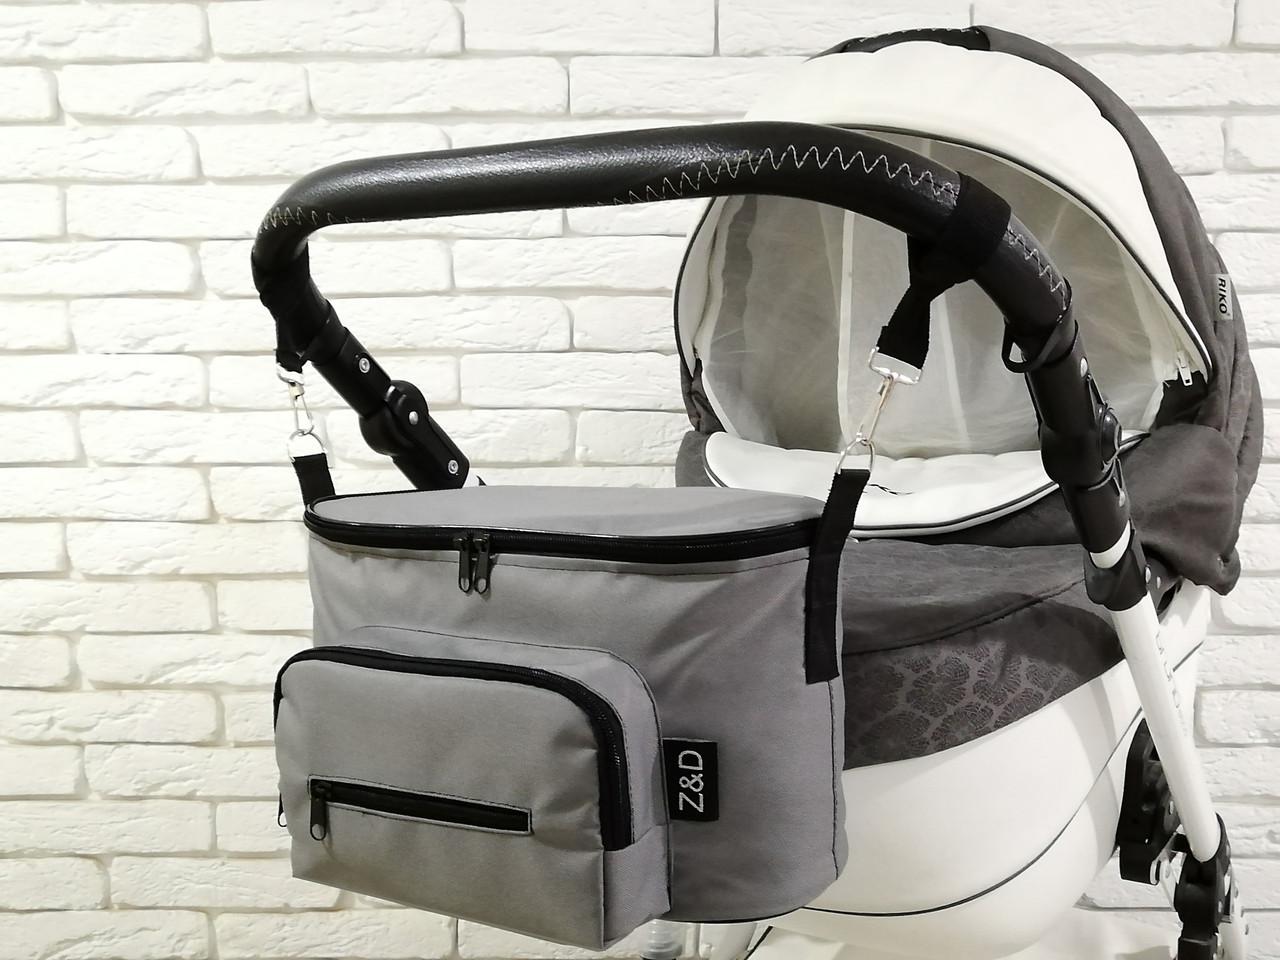 Сумка-органайзер Z&D Smart для коляски (Серый)